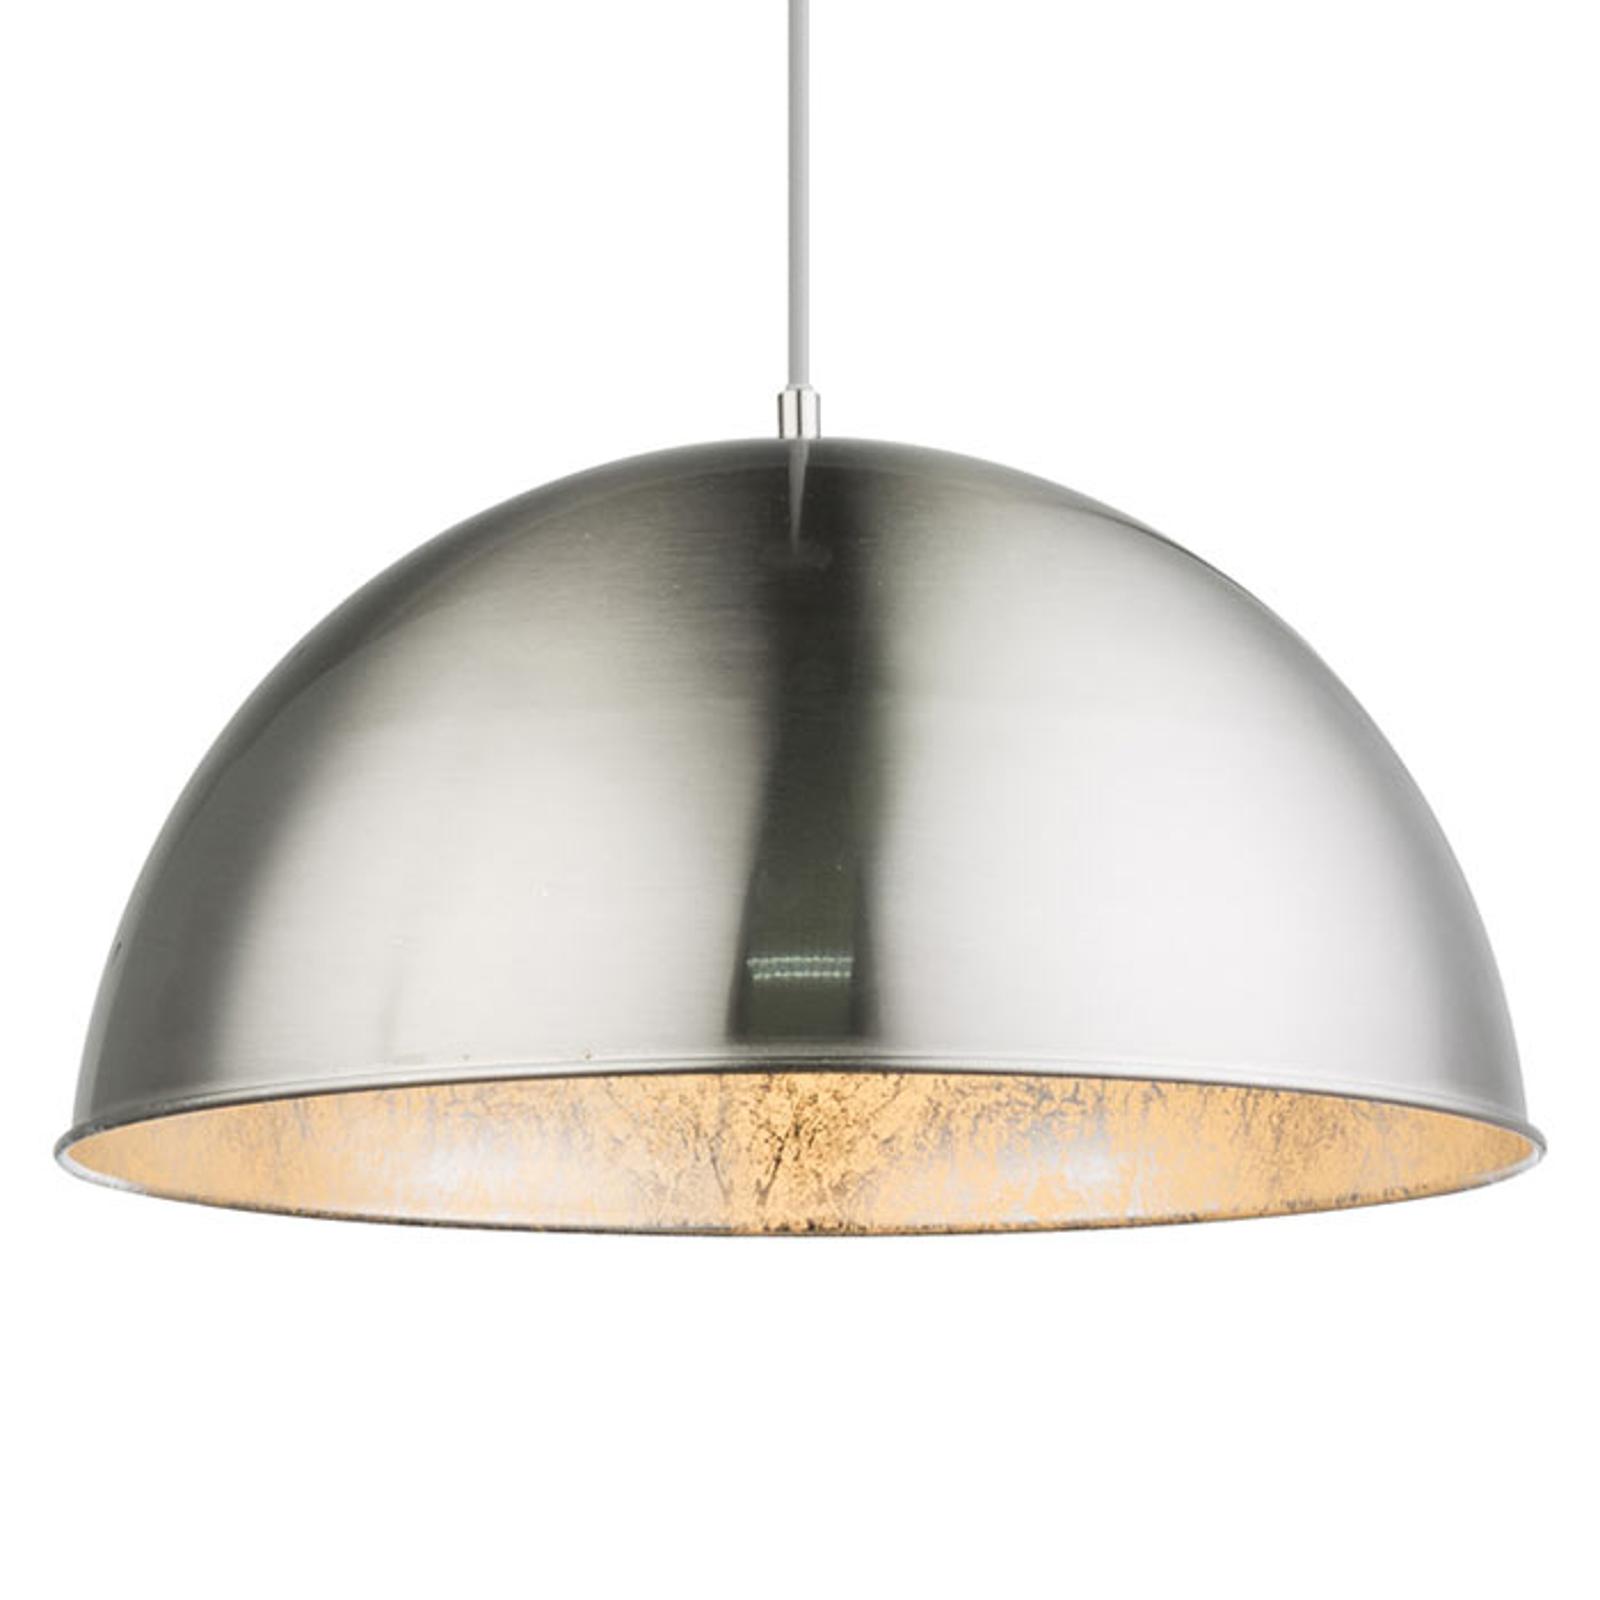 Lampadaire métallique Nosy nickel/argenté